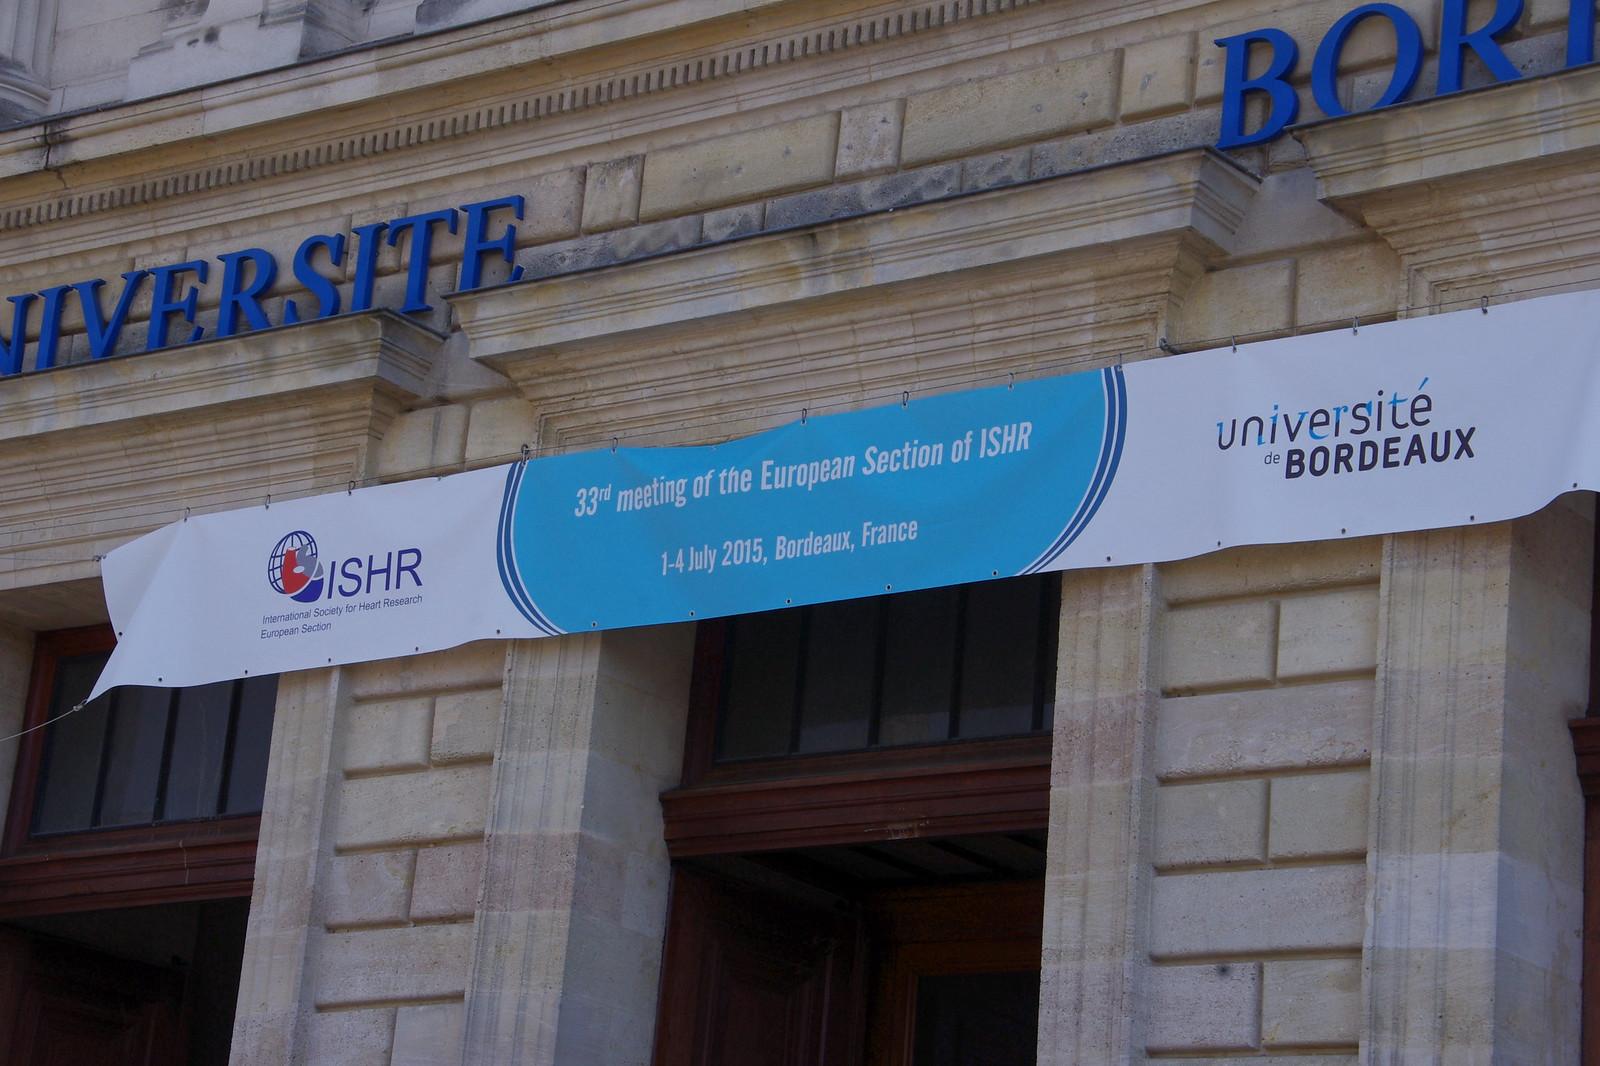 ISHR 2015 - Bordeaux